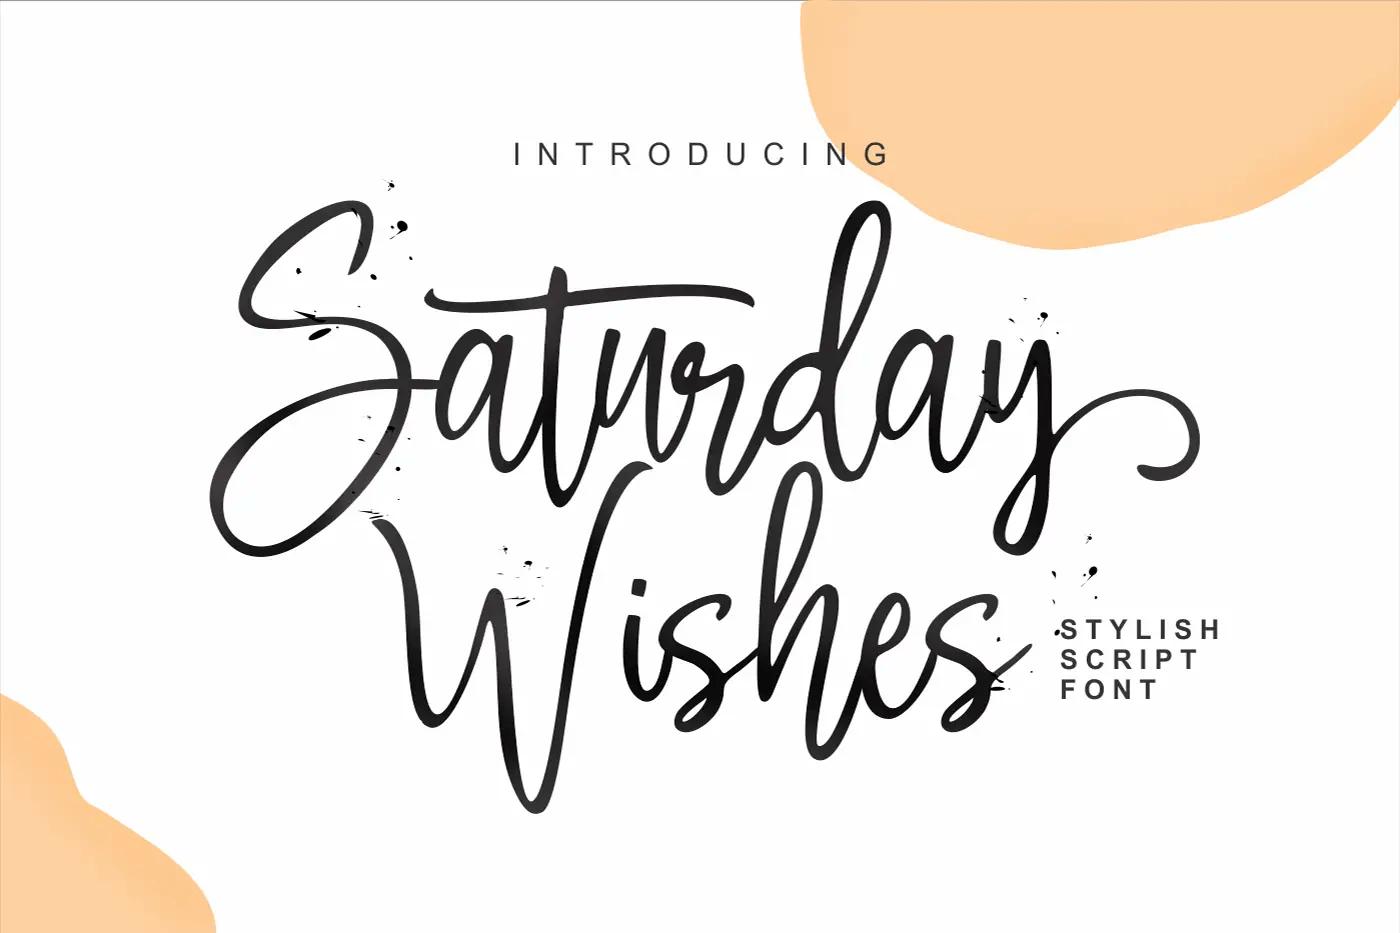 Saturday Wishes Stylish Handwritten Font -1